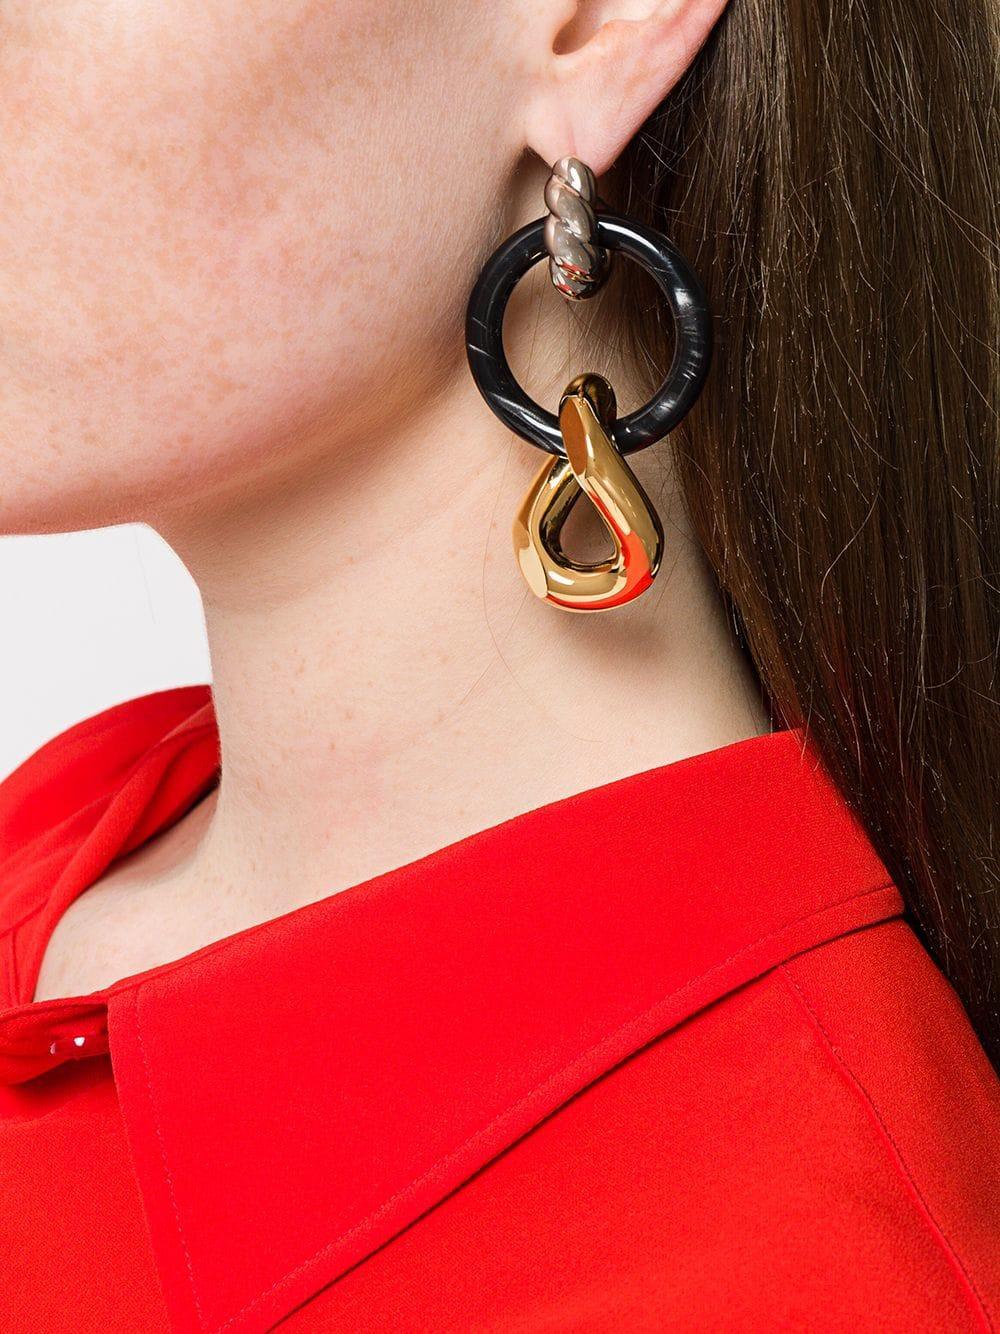 96feb88a6 Balenciaga Loop And Hoop Earrings in Metallic - Lyst